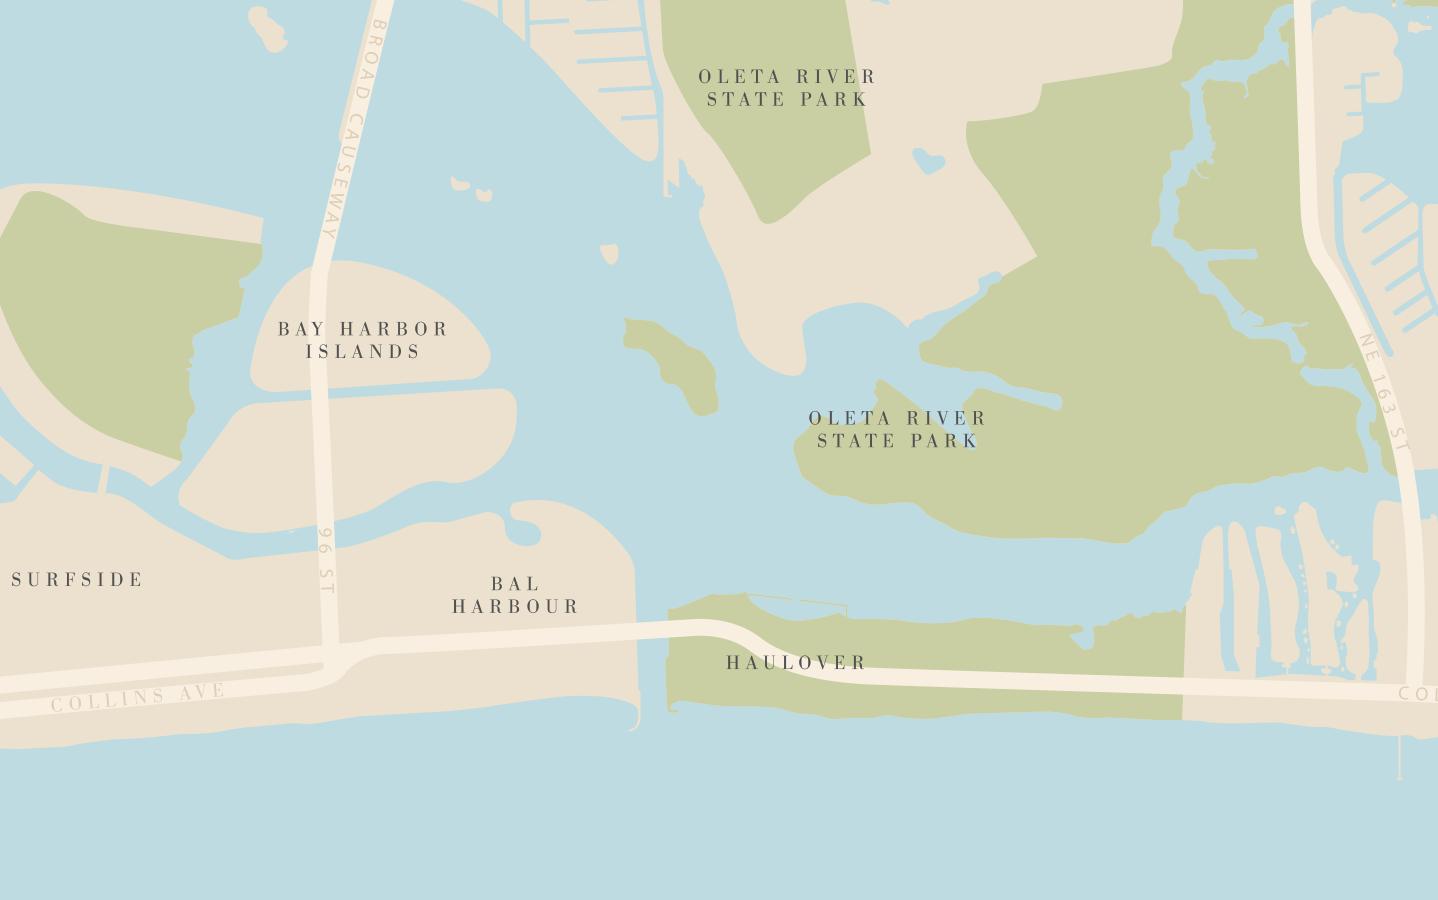 bijou-bay-harbor-on-map